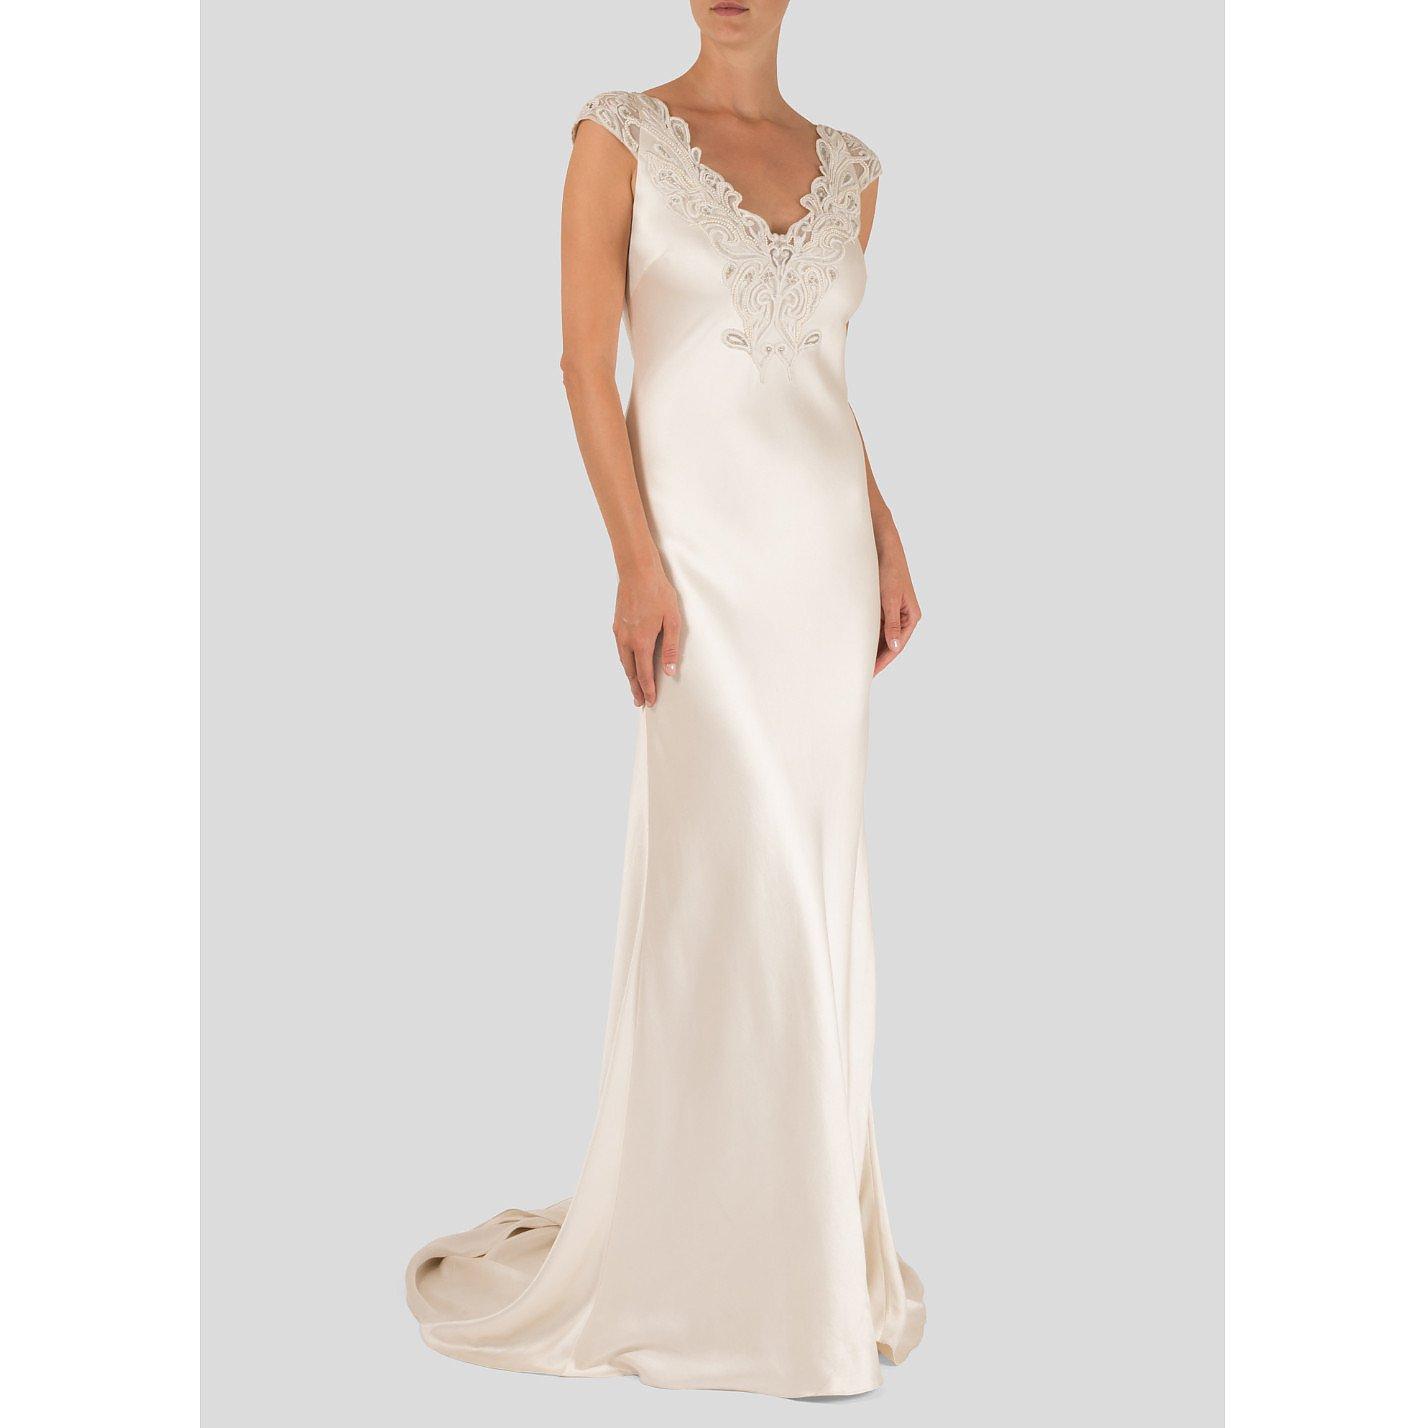 Amanda Wakeley Bridal The Esme Bridal Dress